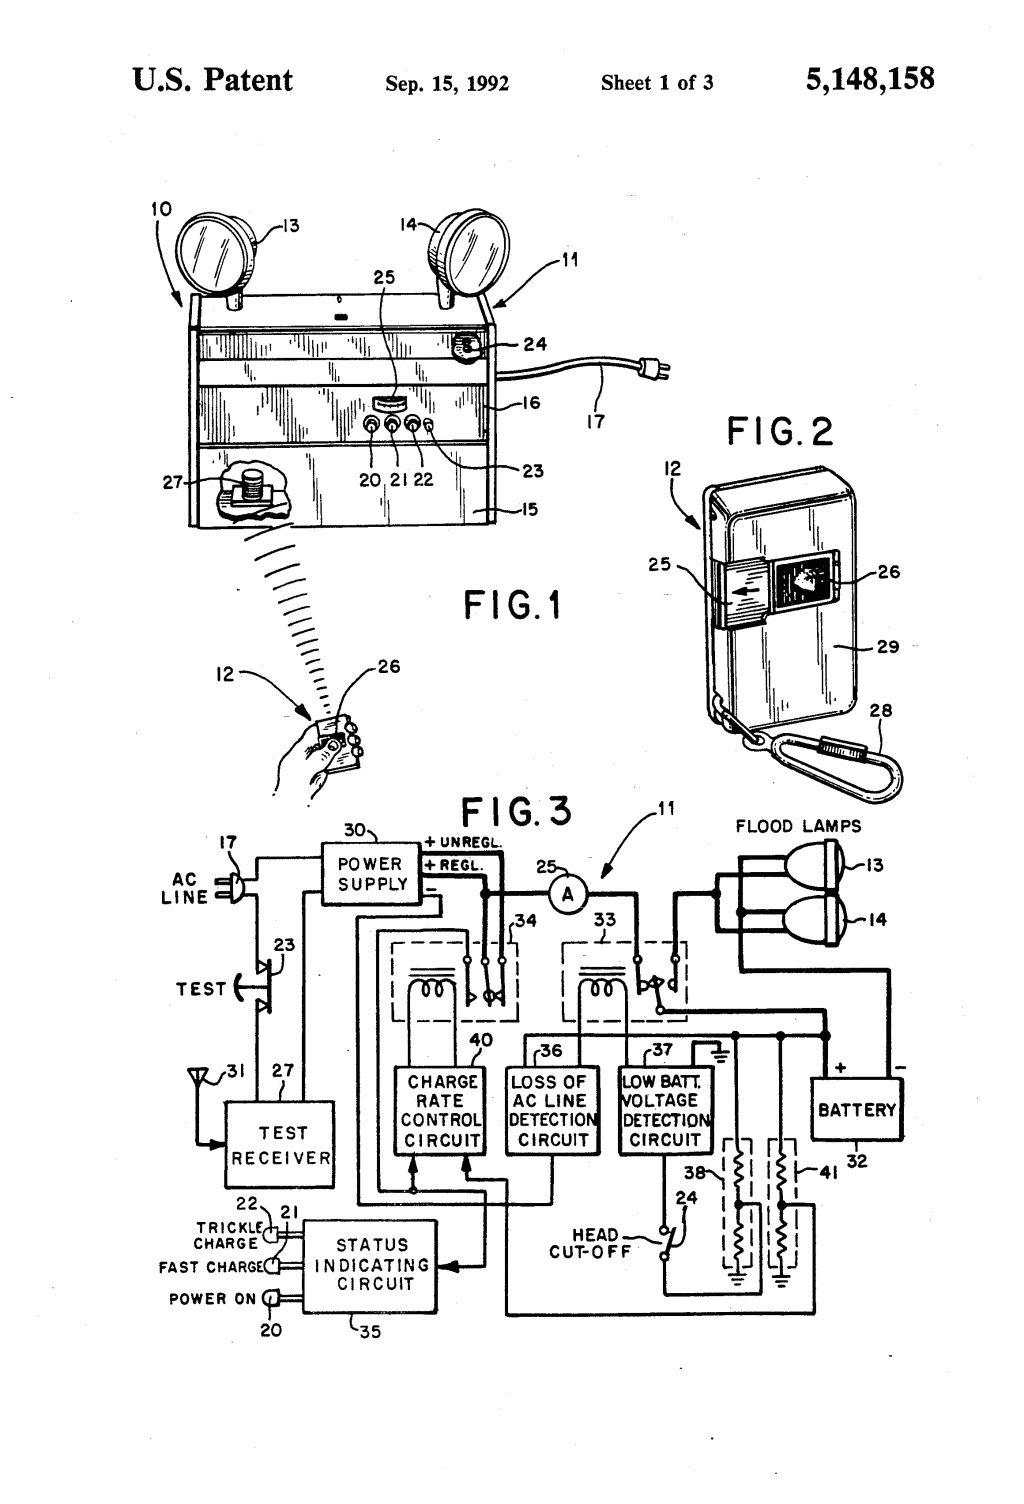 iota i 24 emergency ballast wiring diagram download philips advance ballast wiring diagram best emergency